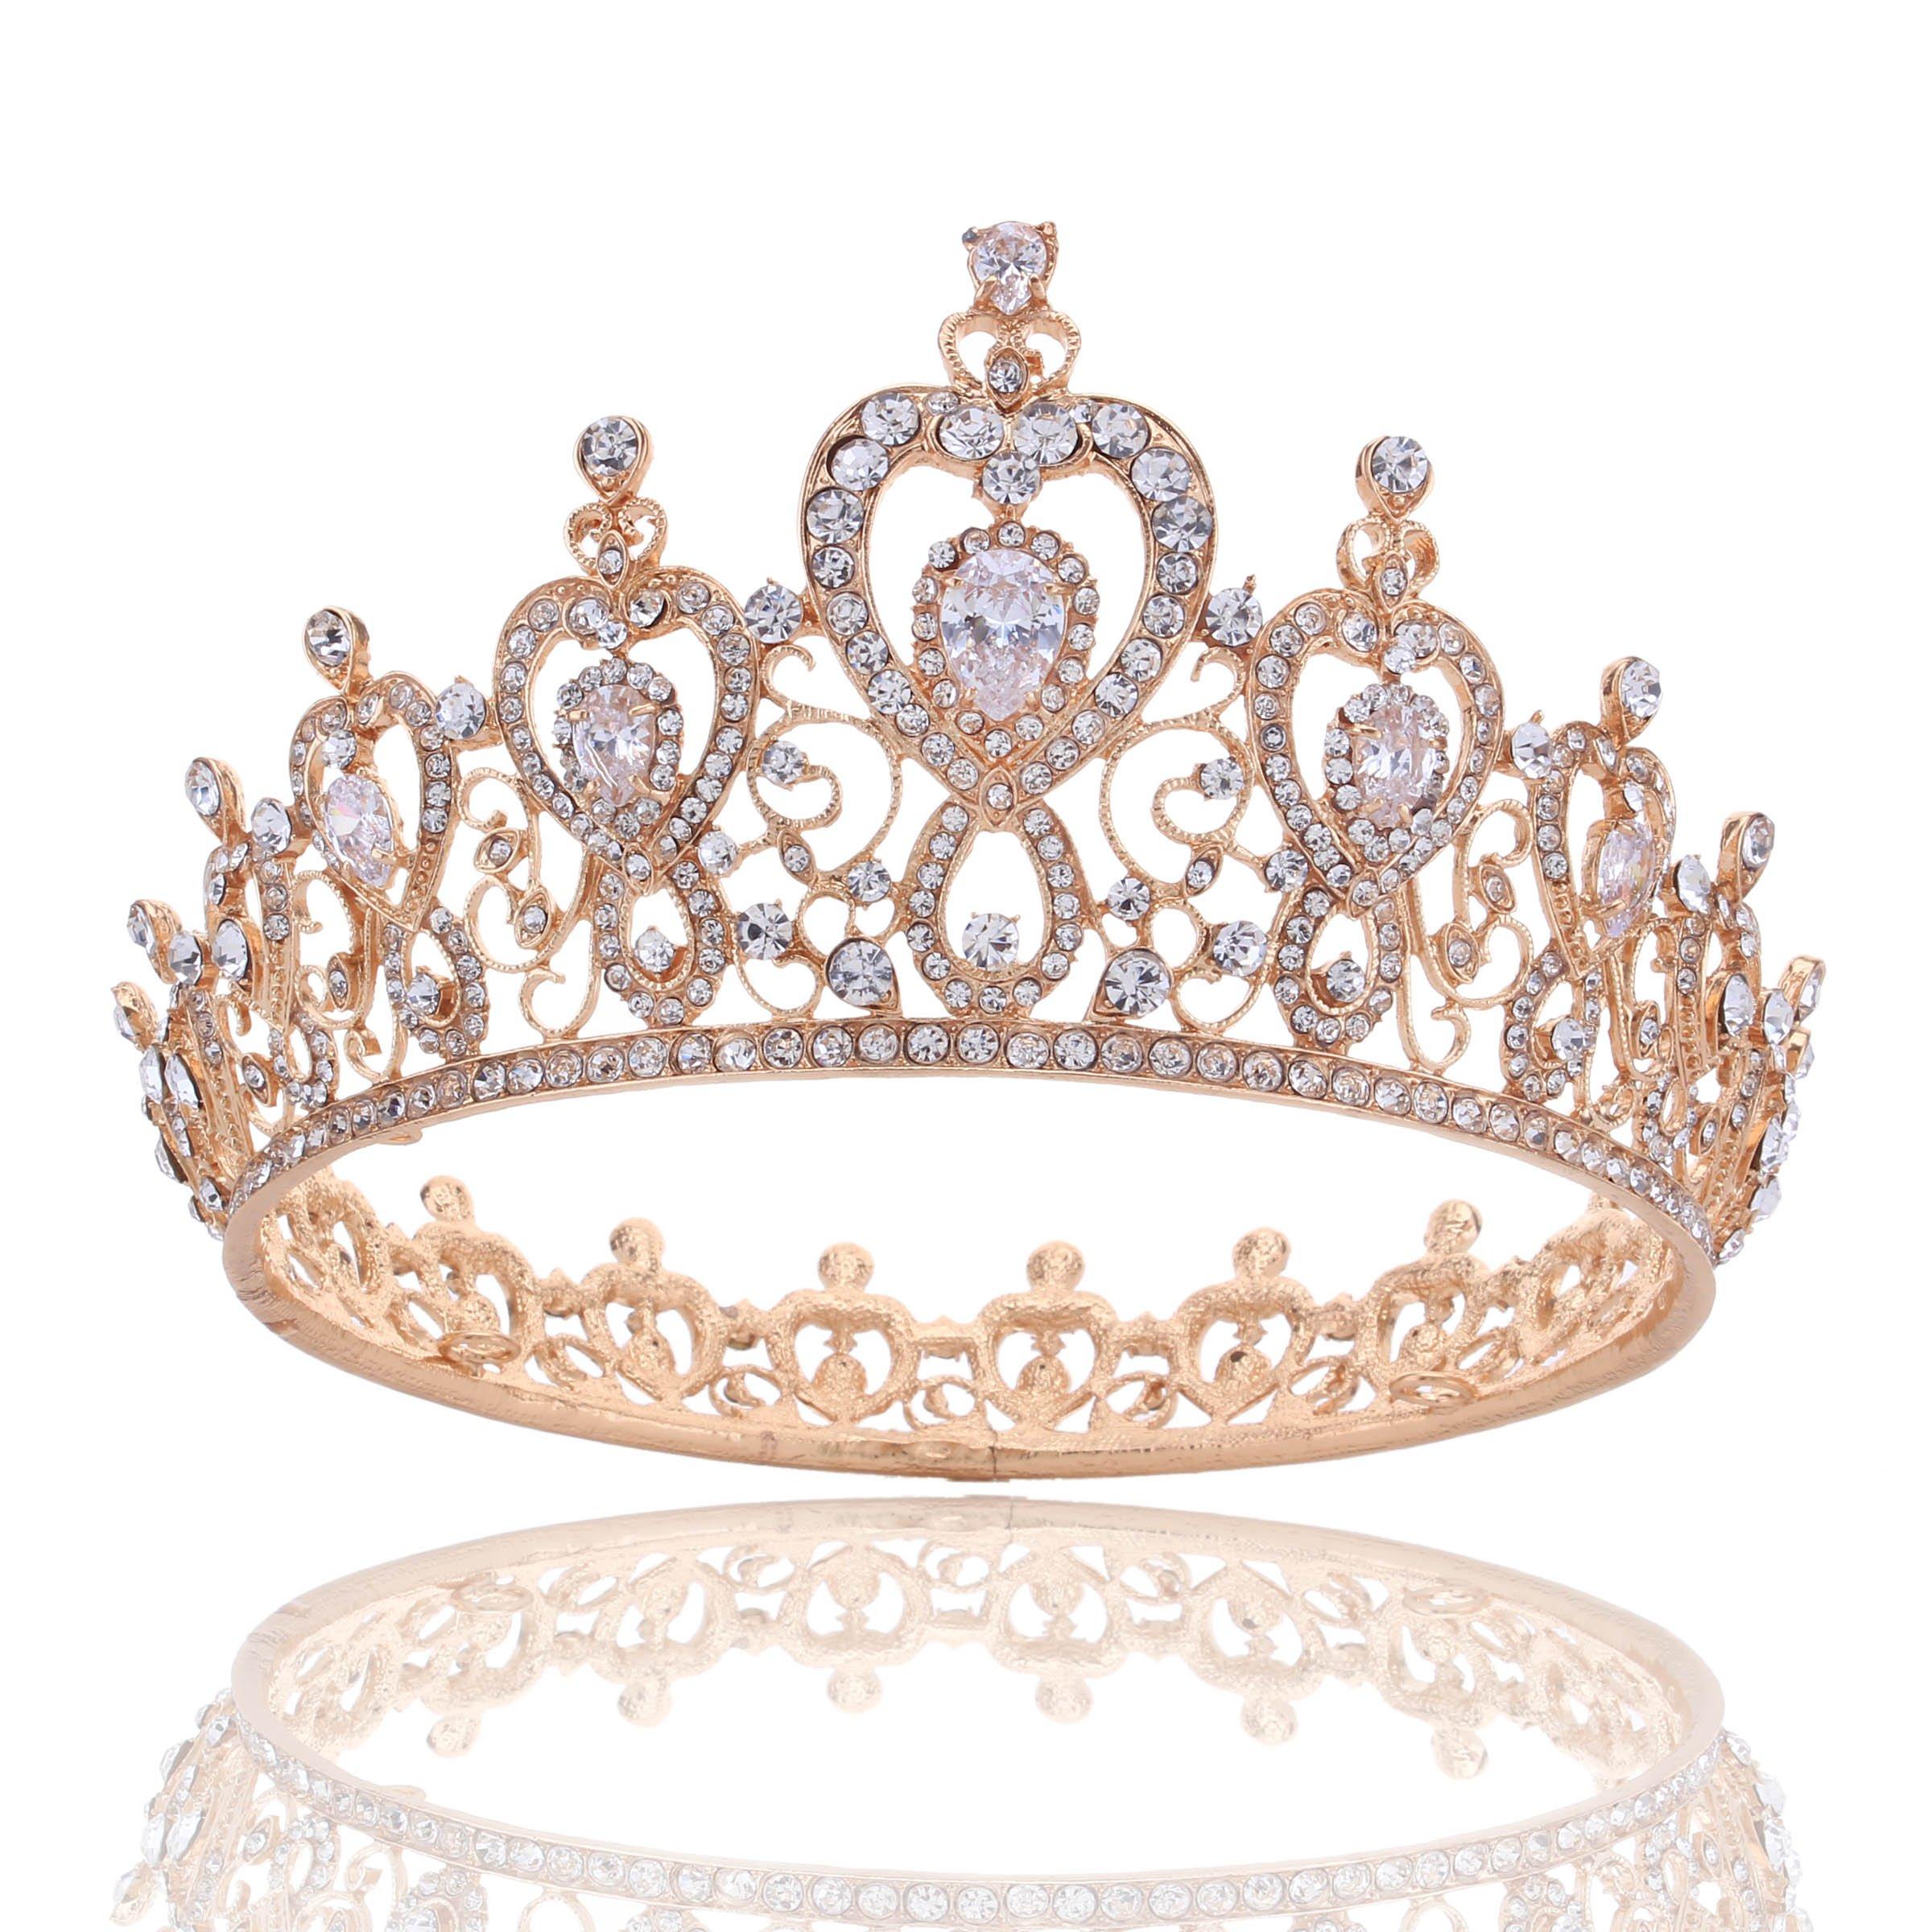 Stuff Crystal Zircon Bridal Tiara Crown Wedding Bride Princess Full Crown (A Style Gold)